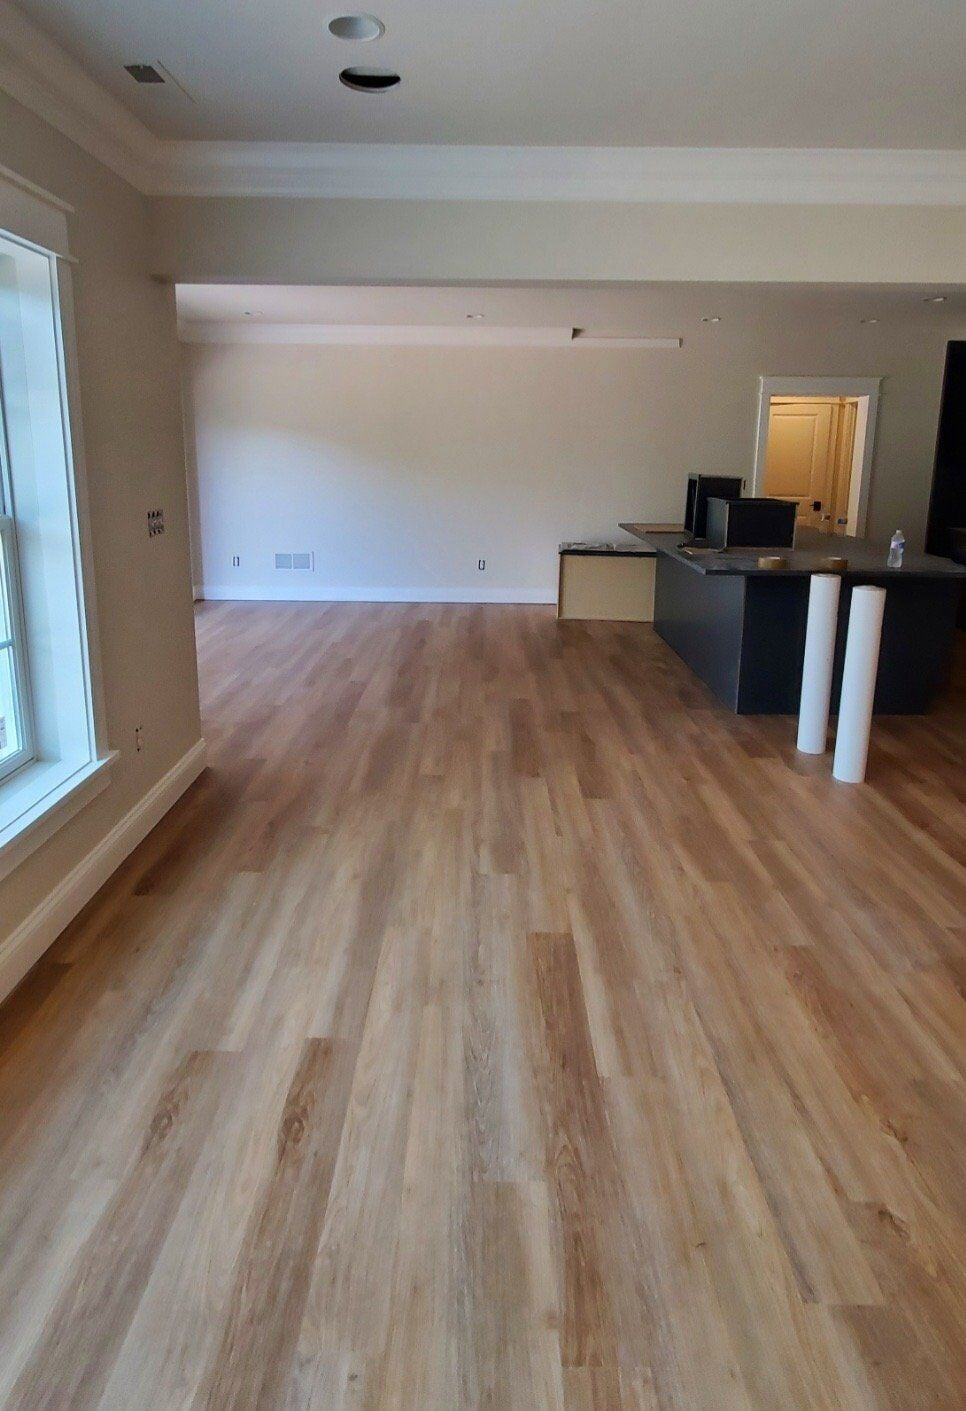 Luxury vinyl plank floors in Nicholasville, KY from Karrianna Flooring